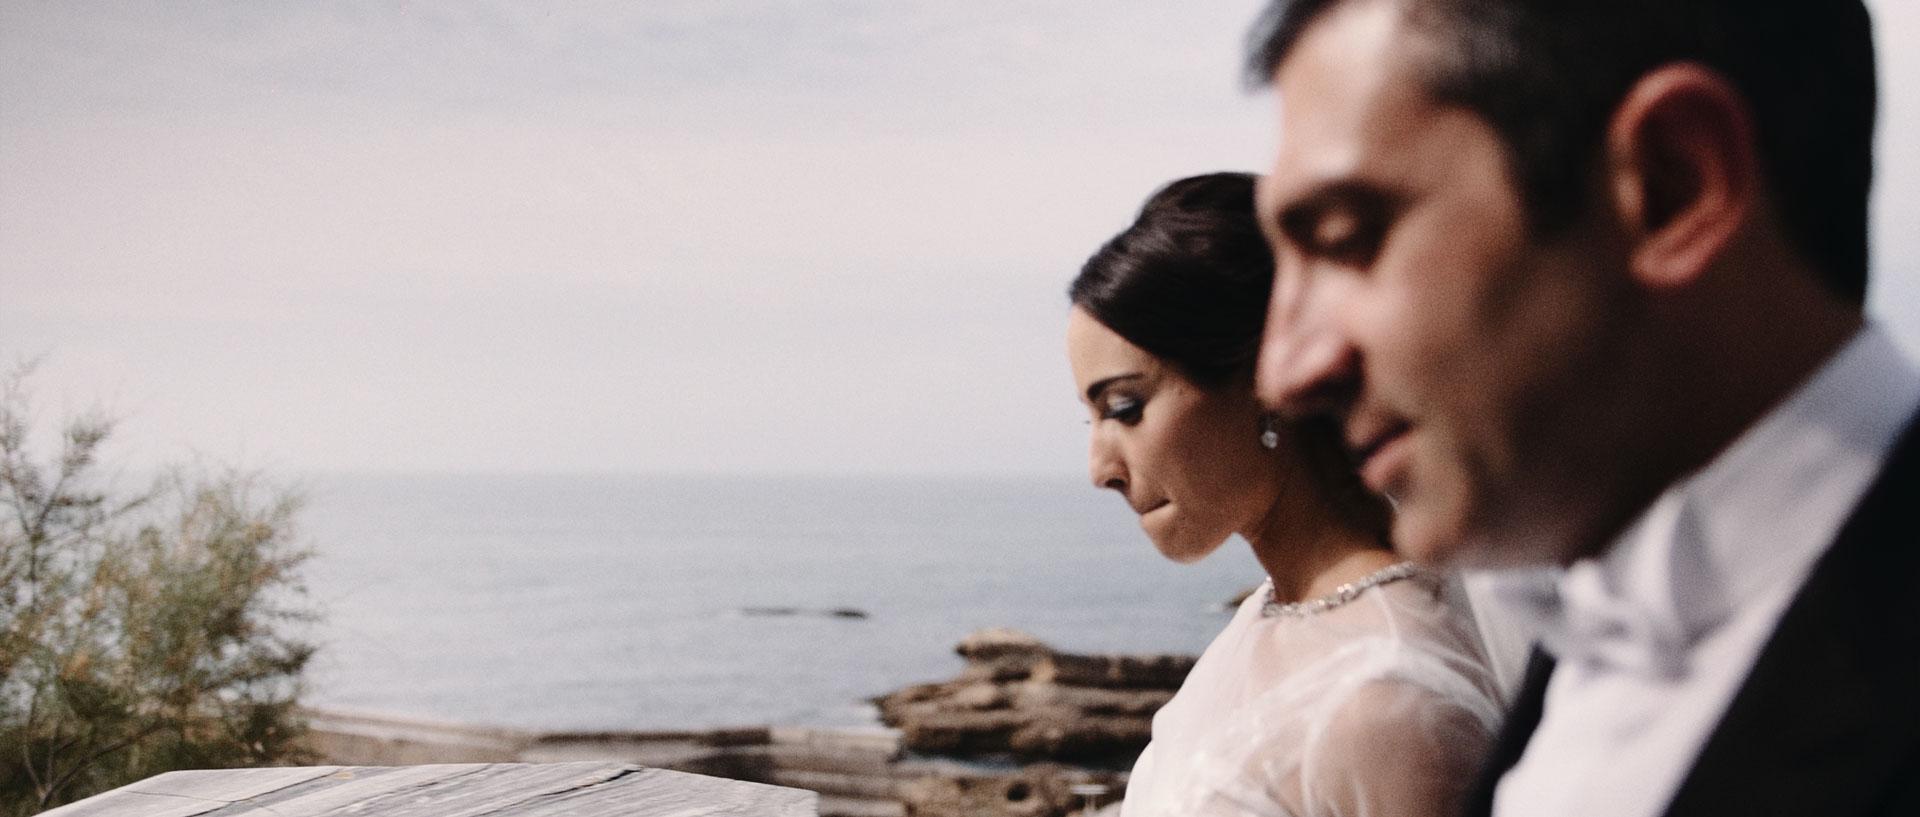 Natasha & Jad Wedding - Casino Biarritz (9).jpg